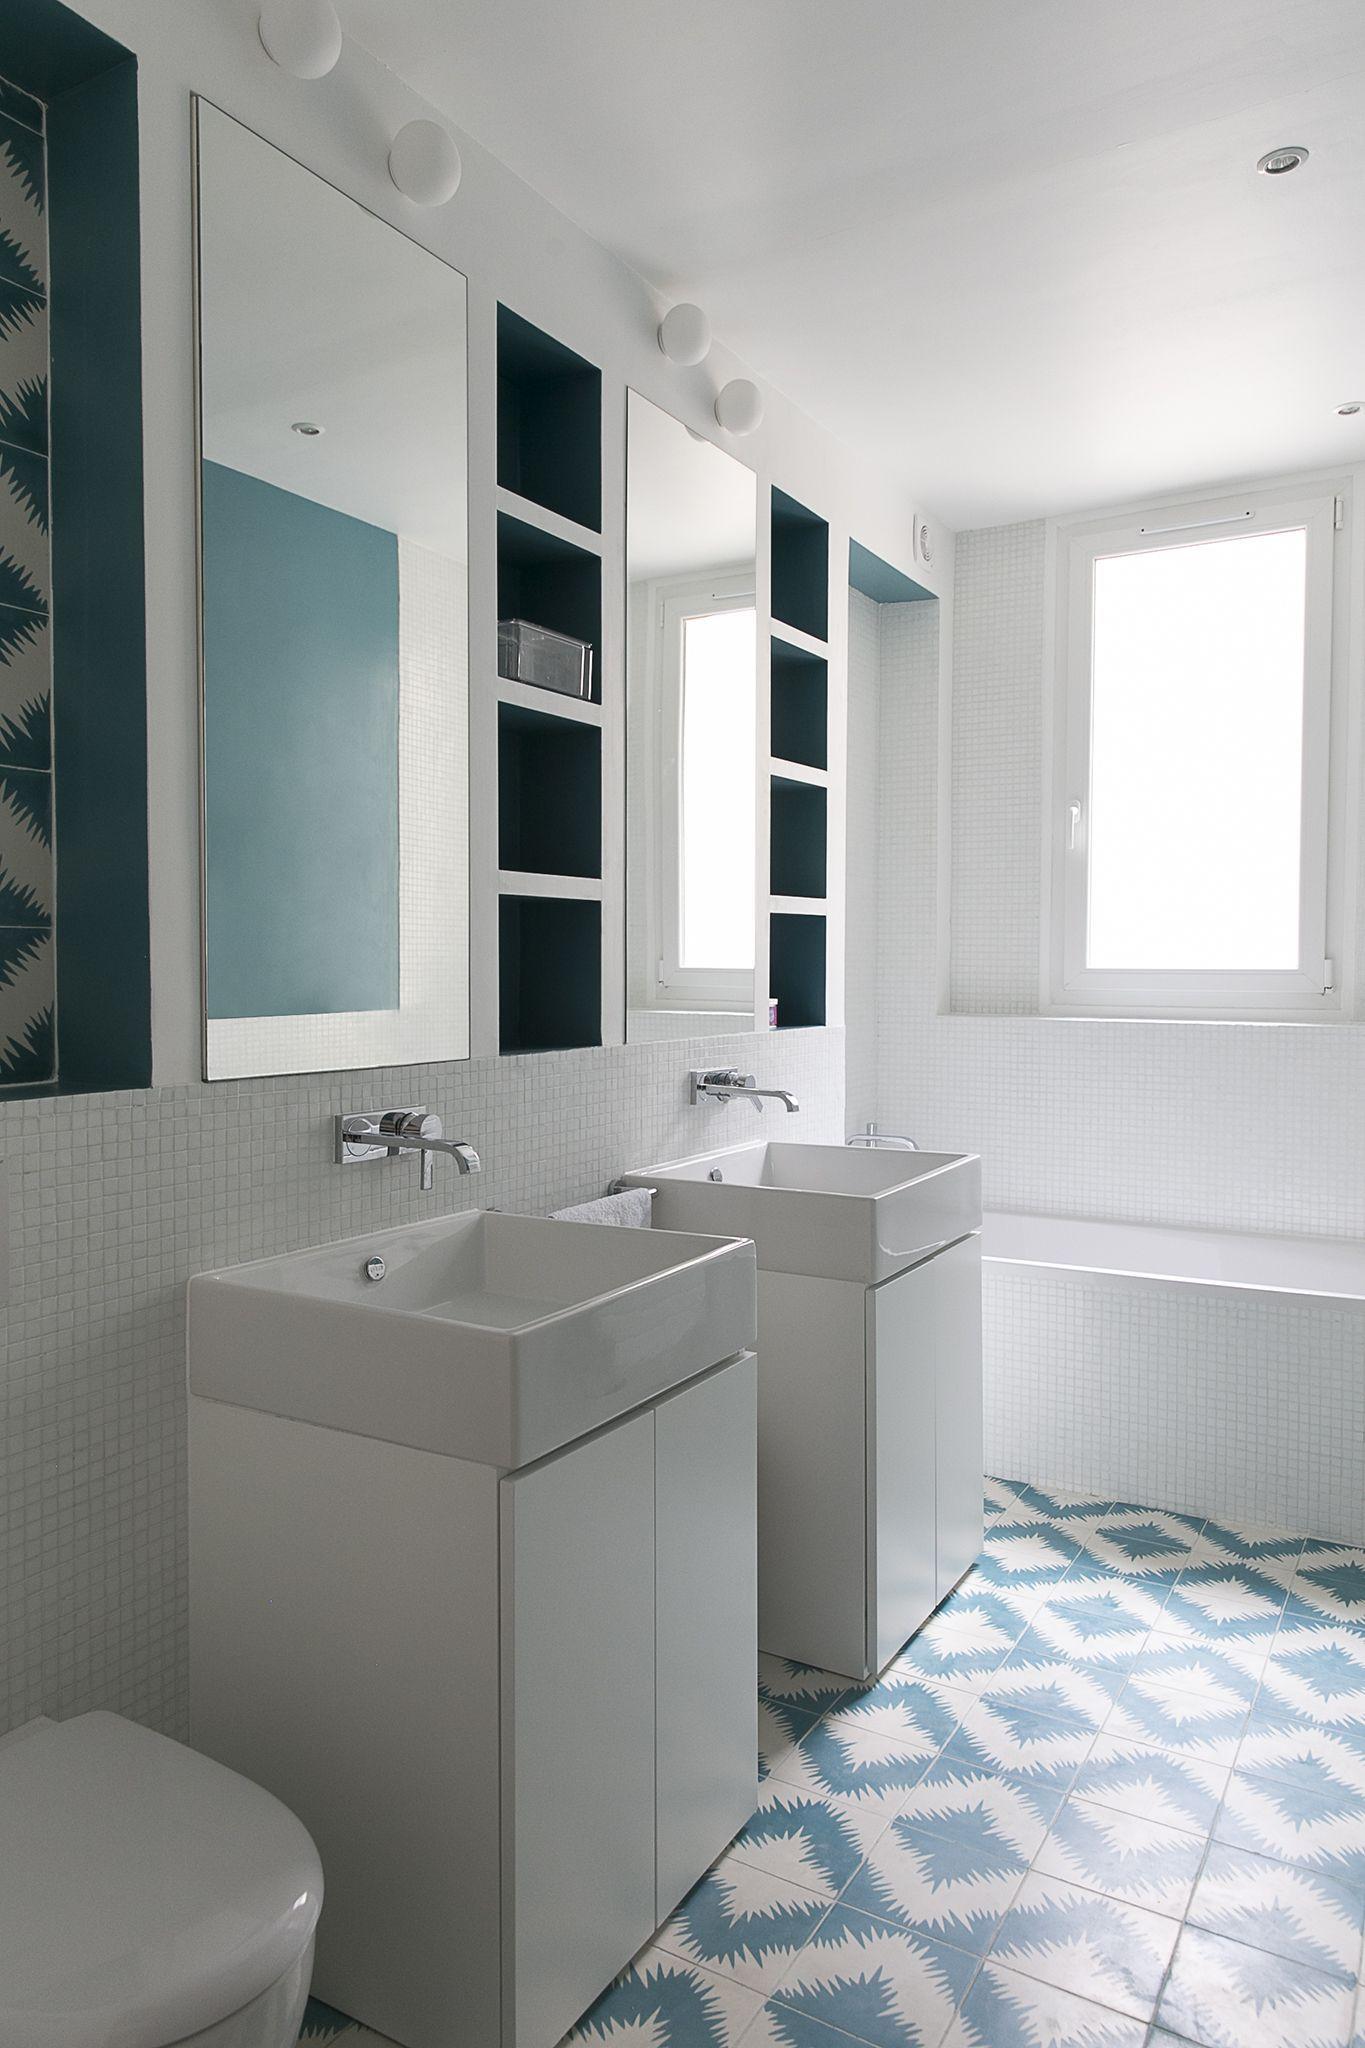 Gcg Architectes carrelage salle de bain argentine gcg architectes bathroom